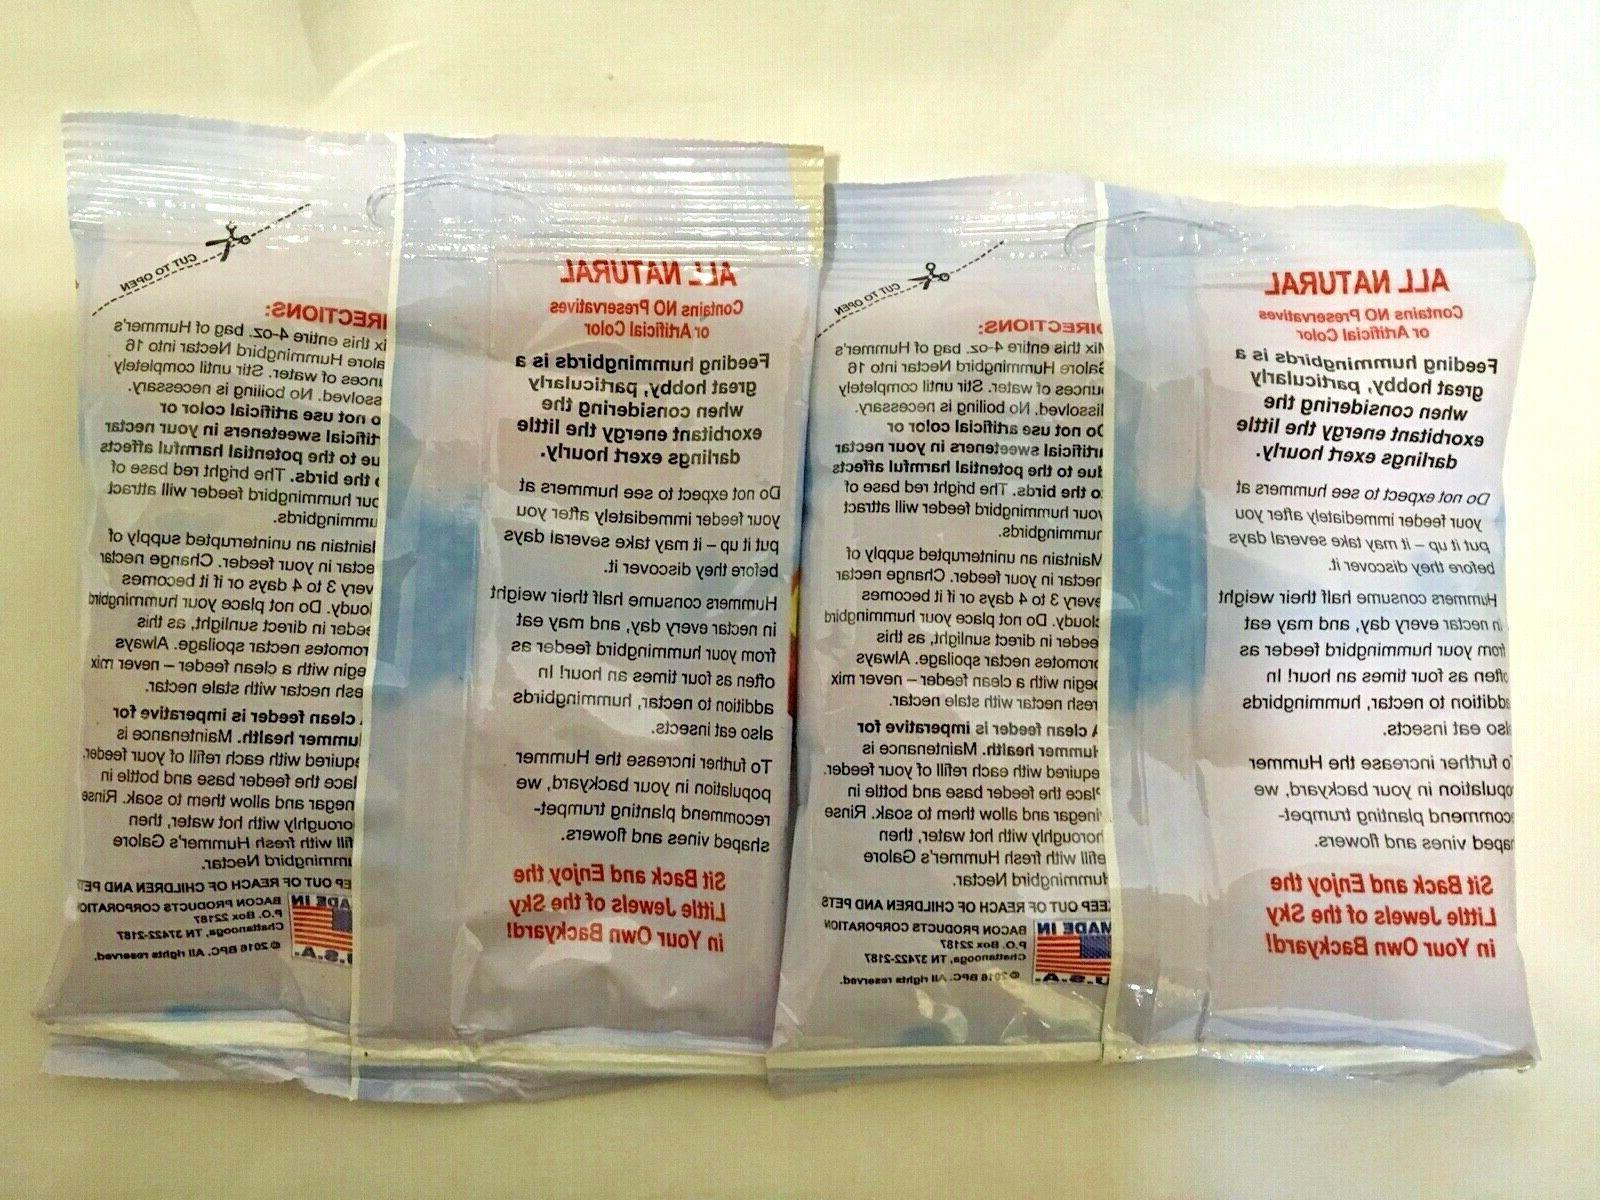 Clear Hummingbird Nectar No Boil 2 Pack Makes FREE Shipping